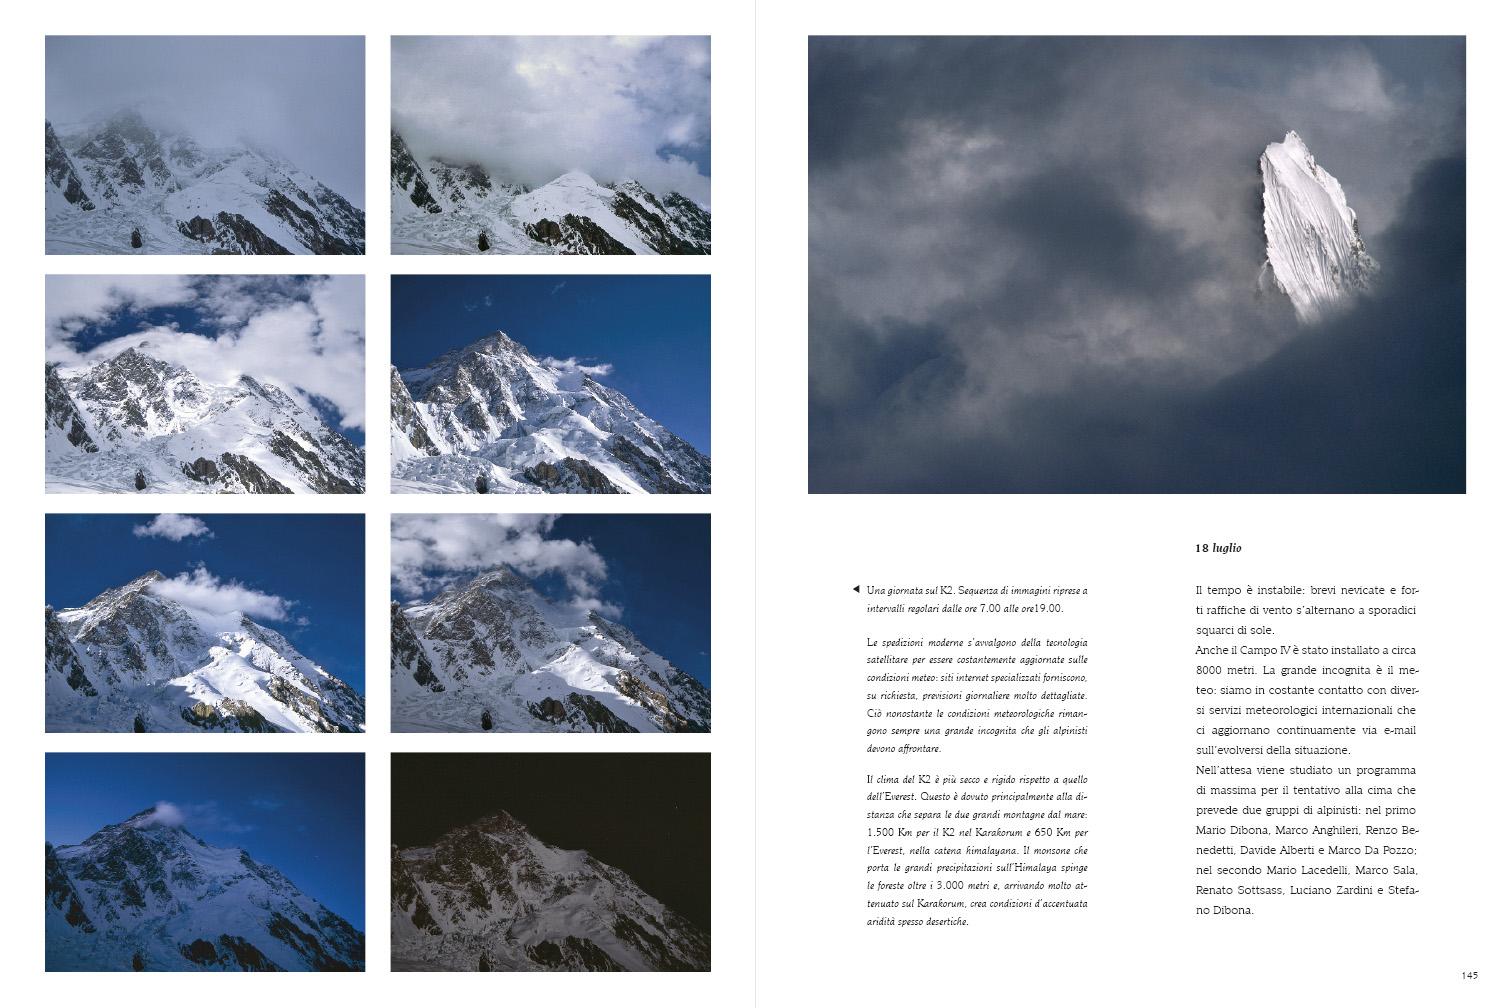 K2 EXPEDITION 1954-2004 Giuseppe Ghedina Fotografo - 074.jpg